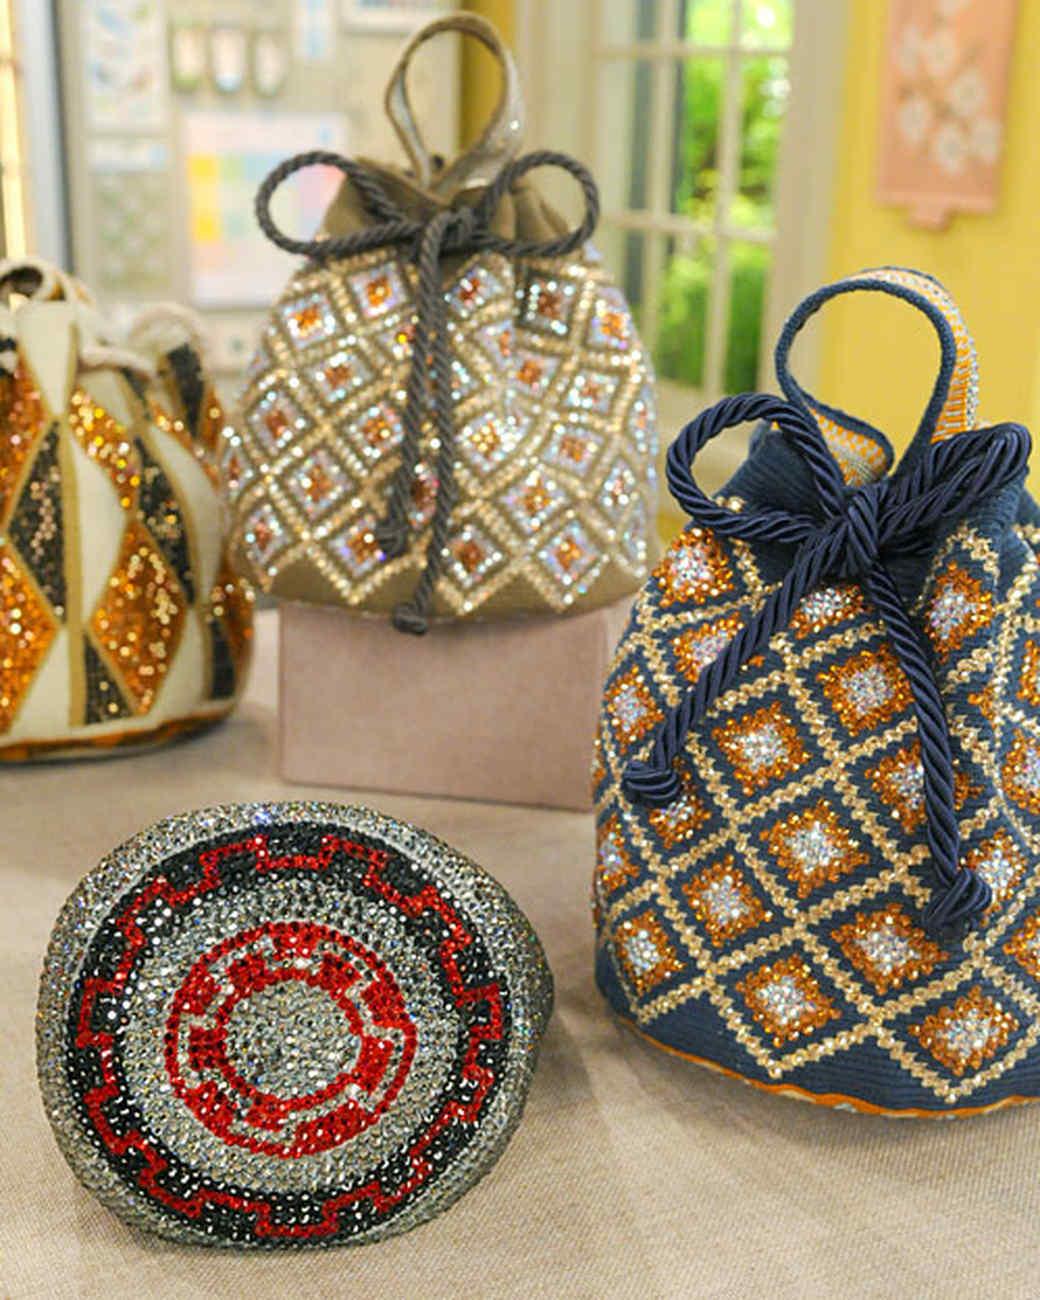 Swarovski Crystal Embellished Handbag Amp Video Martha Stewart